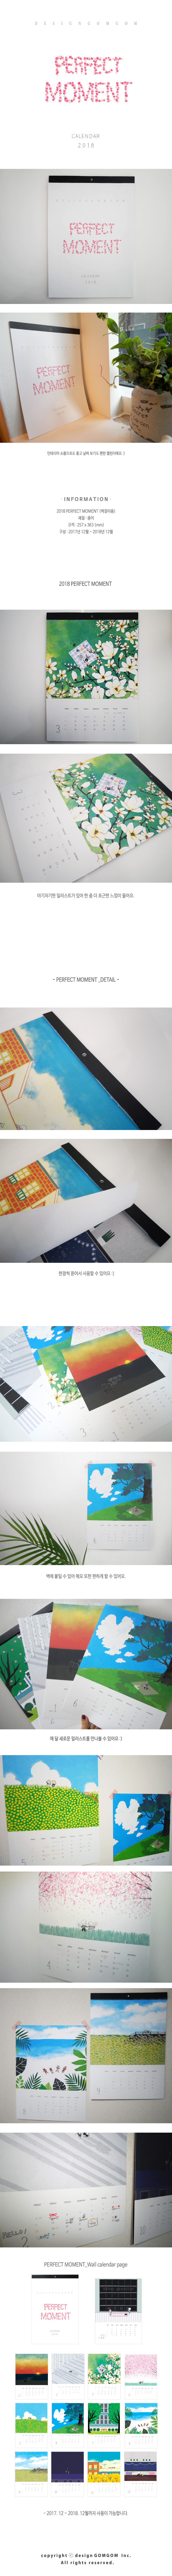 2018 Moment wall calendar6,500원-디자인곰곰디자인문구, 다이어리/캘린더, 캘린더, 벽걸이캘린더날짜형바보사랑2018 Moment wall calendar6,500원-디자인곰곰디자인문구, 다이어리/캘린더, 캘린더, 벽걸이캘린더날짜형바보사랑